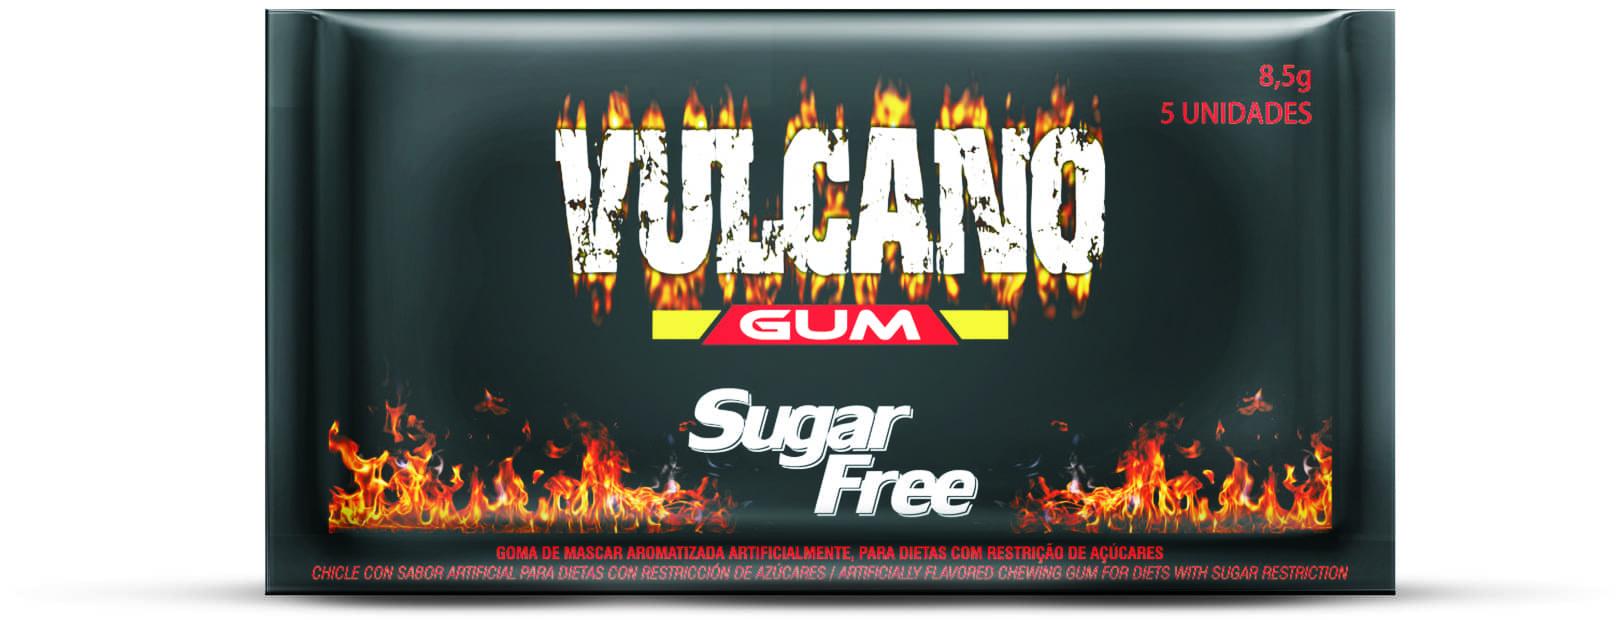 217865_388269_vulcano_gum_sugar_free